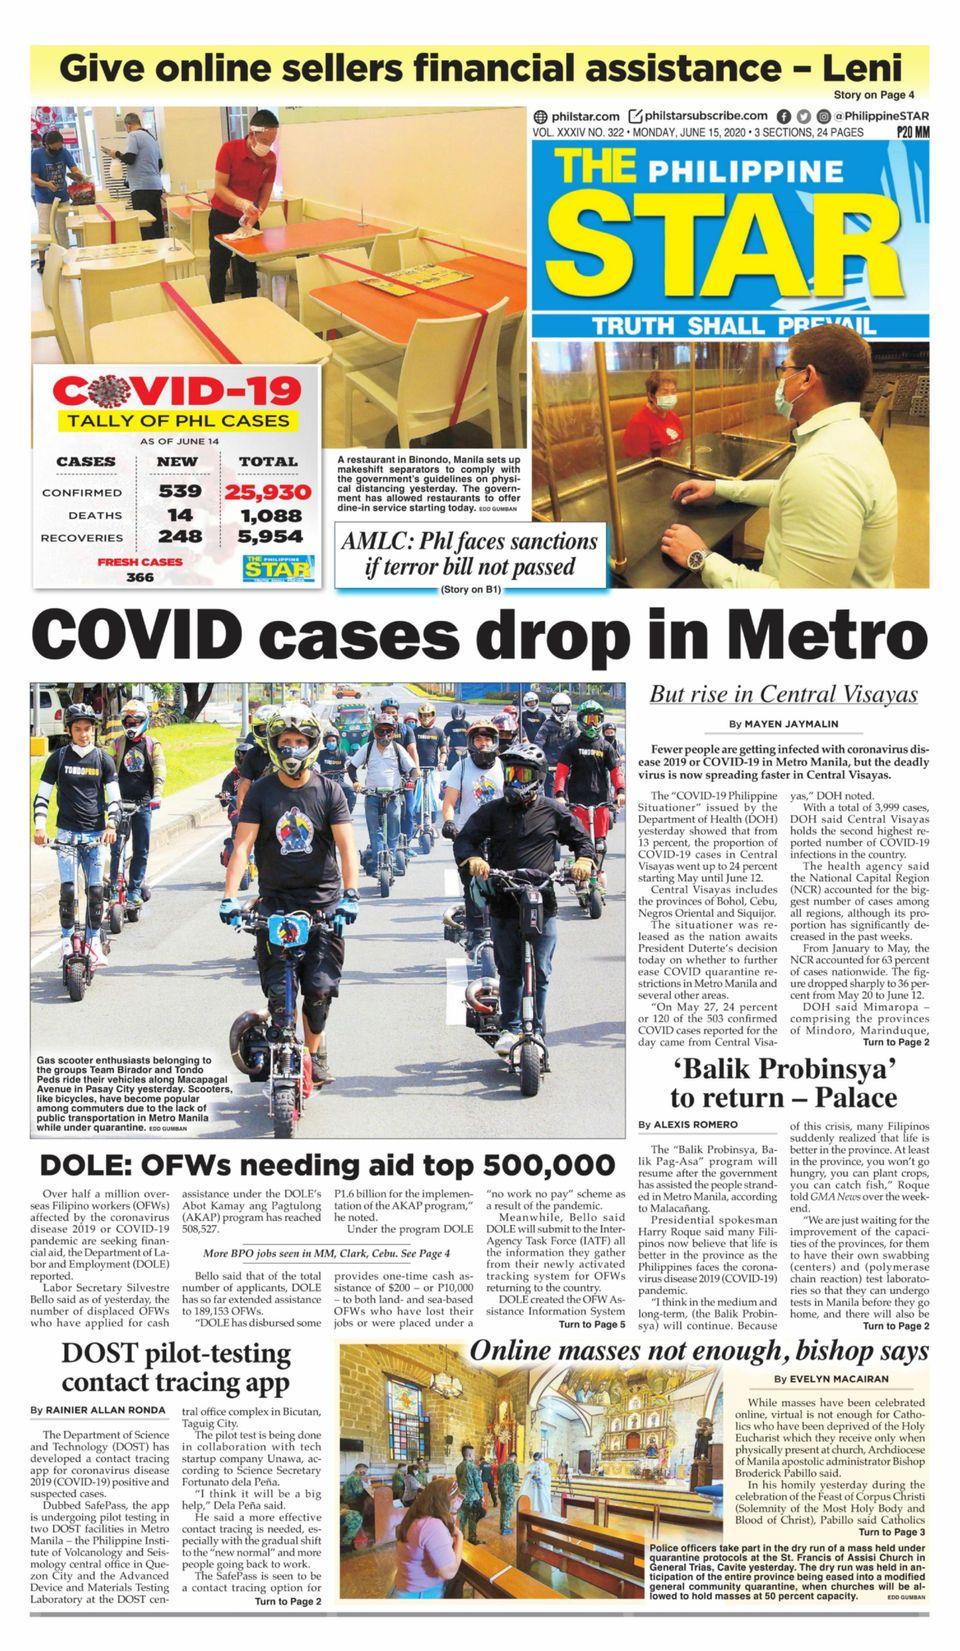 Star philippine daily Philippines' ex